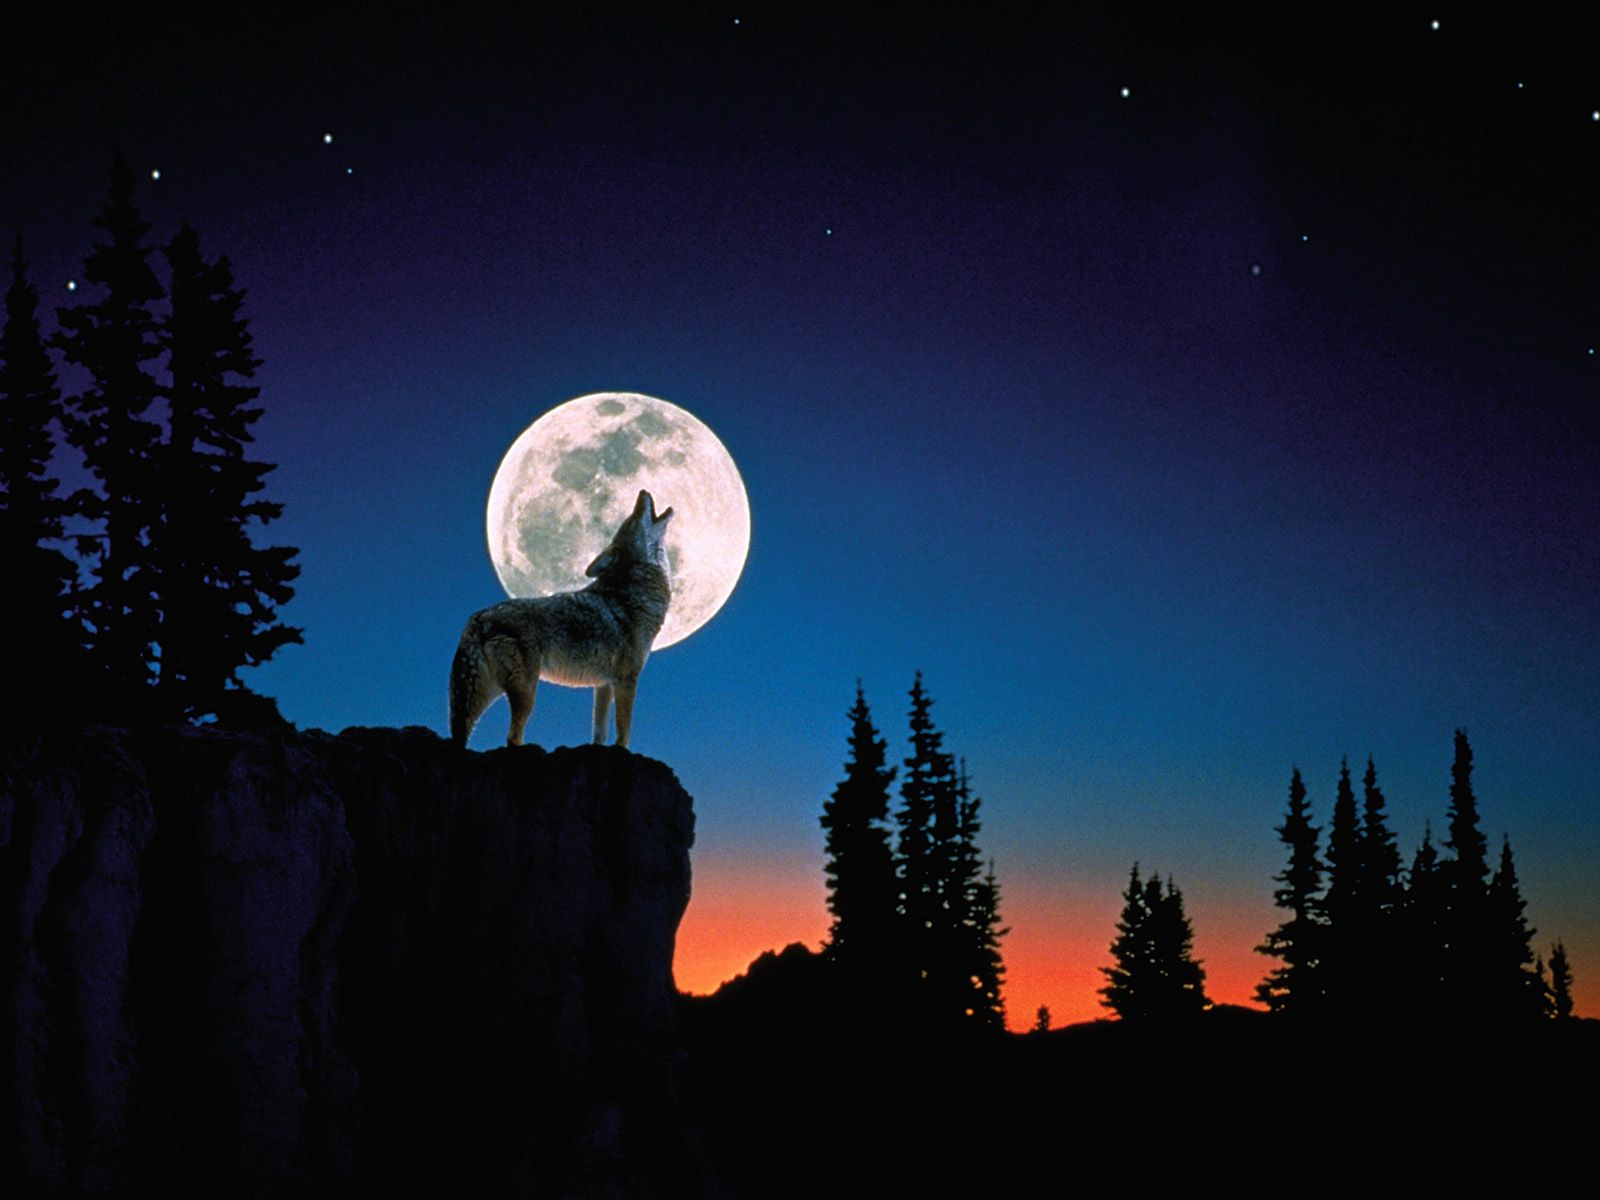 Wolf Howling Full Moon Desktop Wallpaper 7571 Frenzia Com Wolf Howling At Moon Wolf Wallpaper Wolf Howling